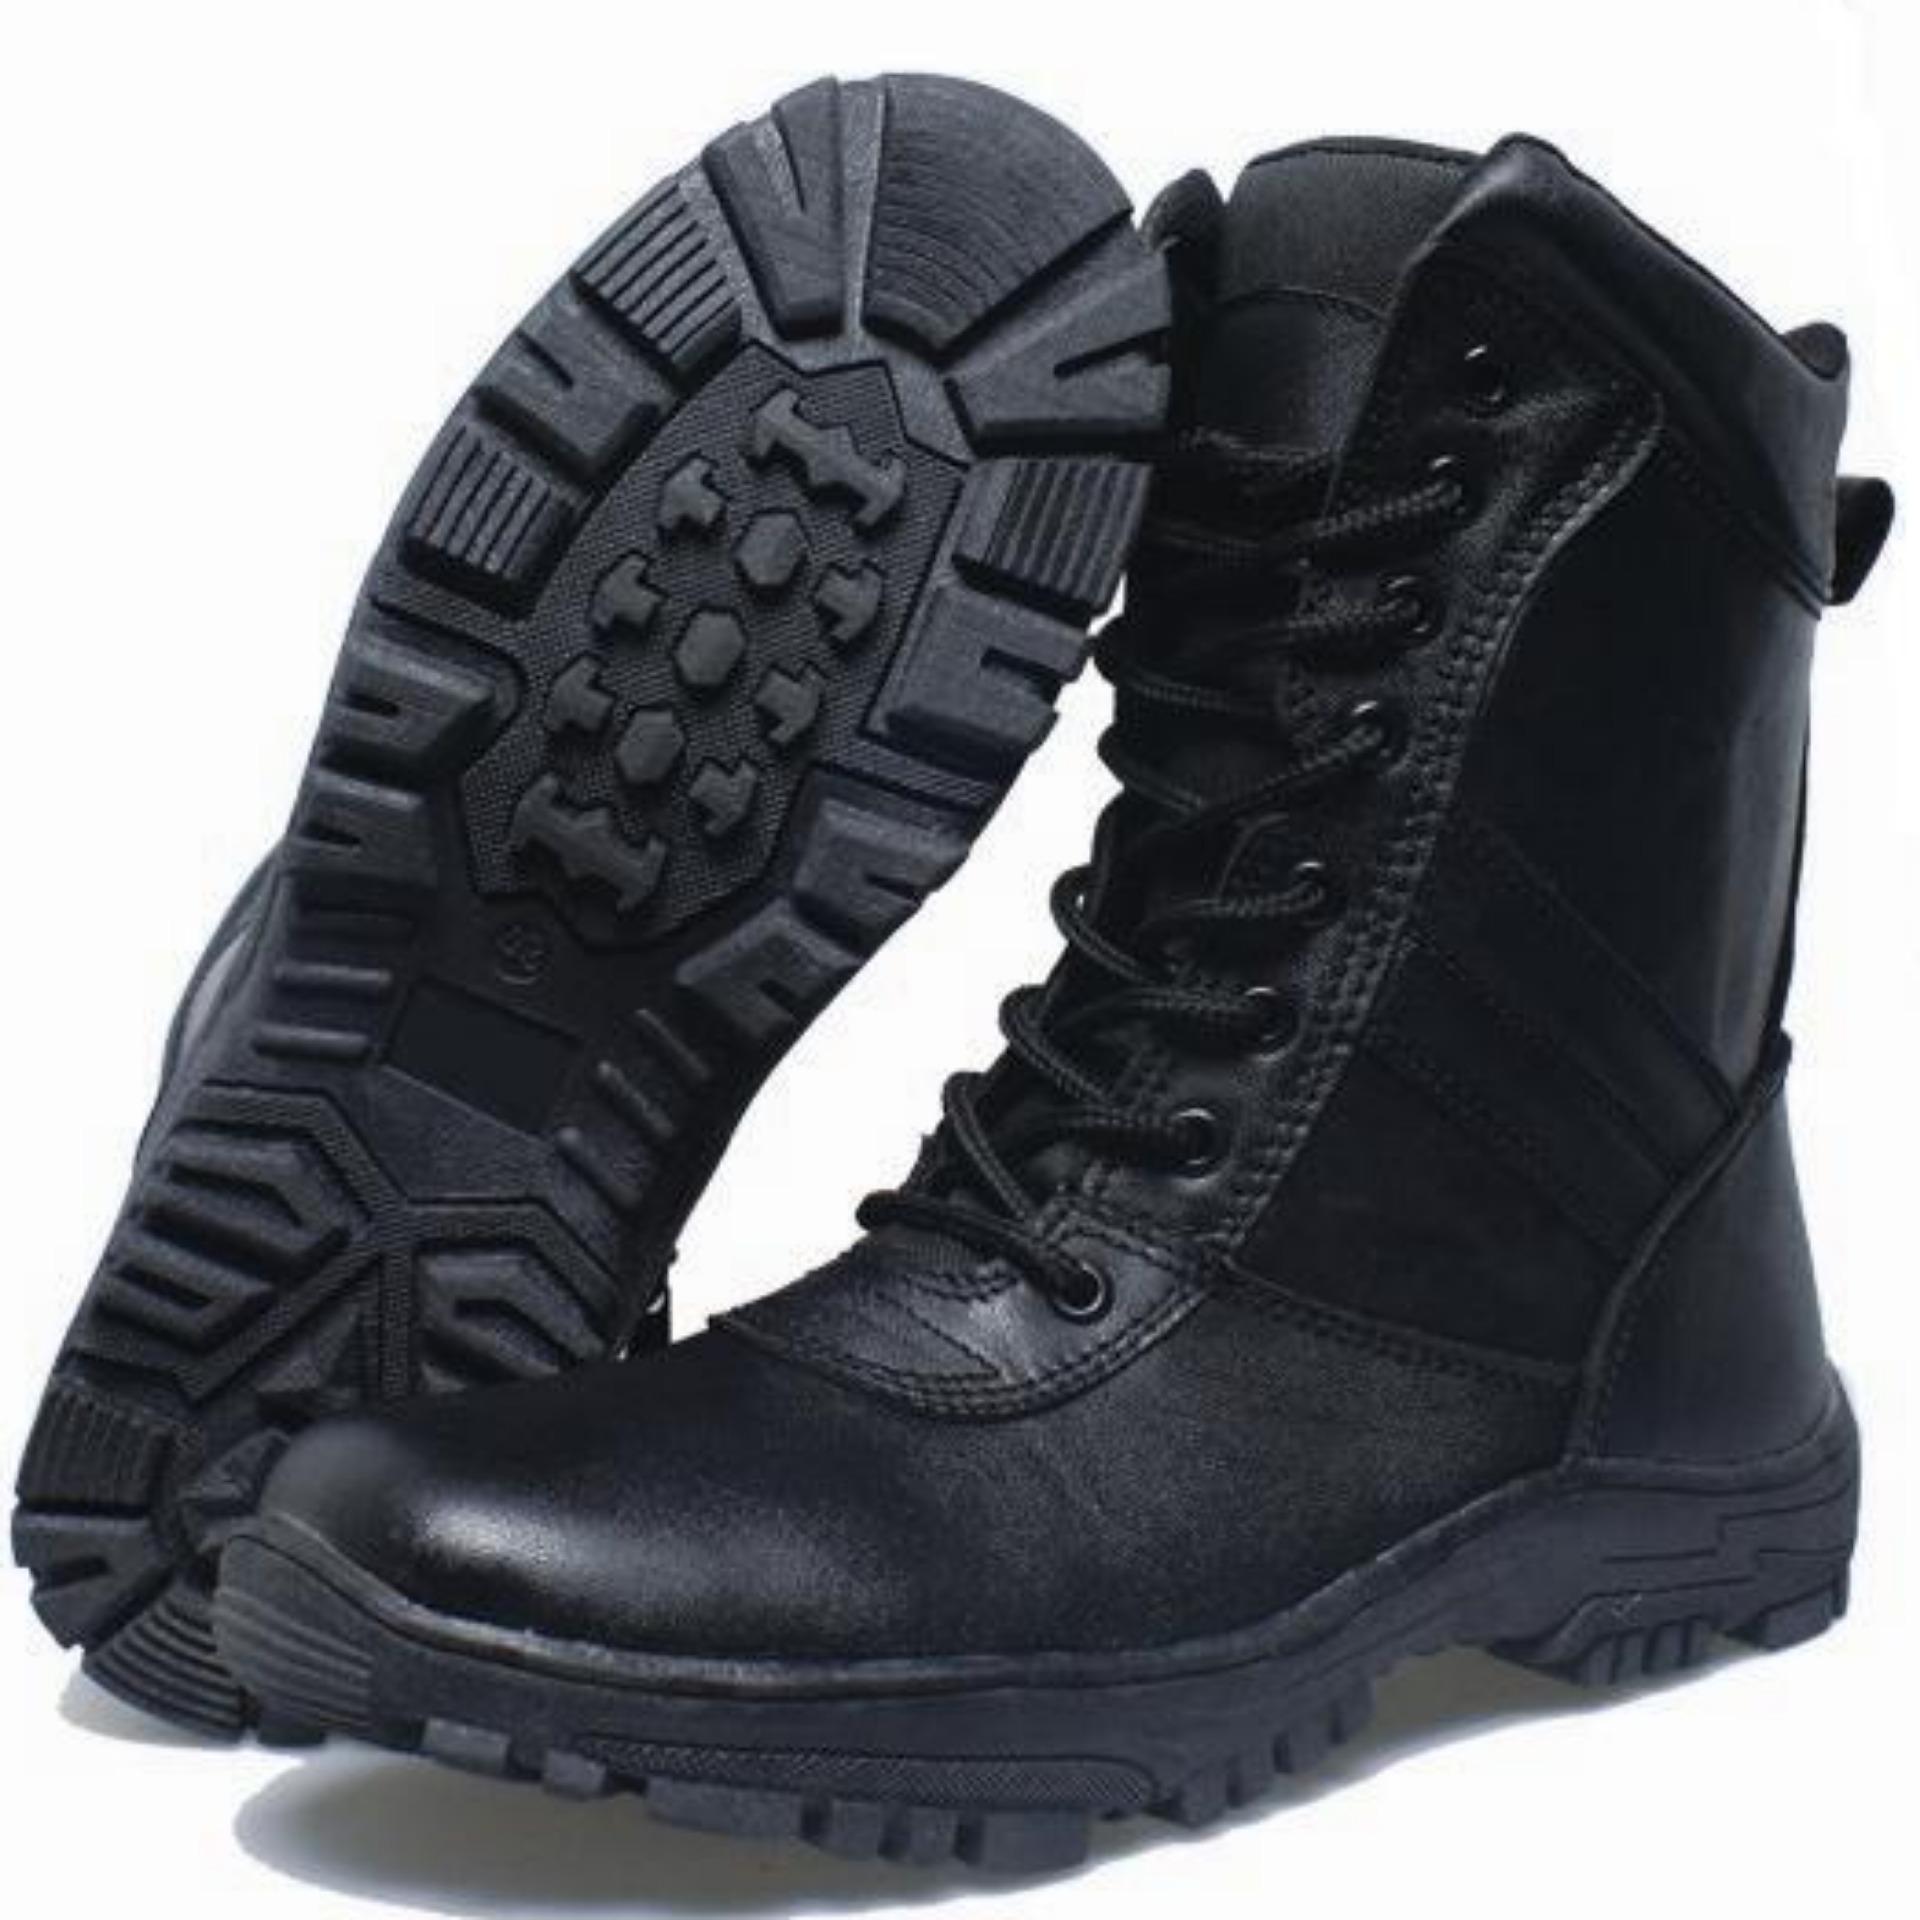 BSM Soga Sepatu Boot Kulit Asli PDL PDH Touring Bikers OutdoorHiking  Lapangan - Boots Kulit Best 9c2d364b96